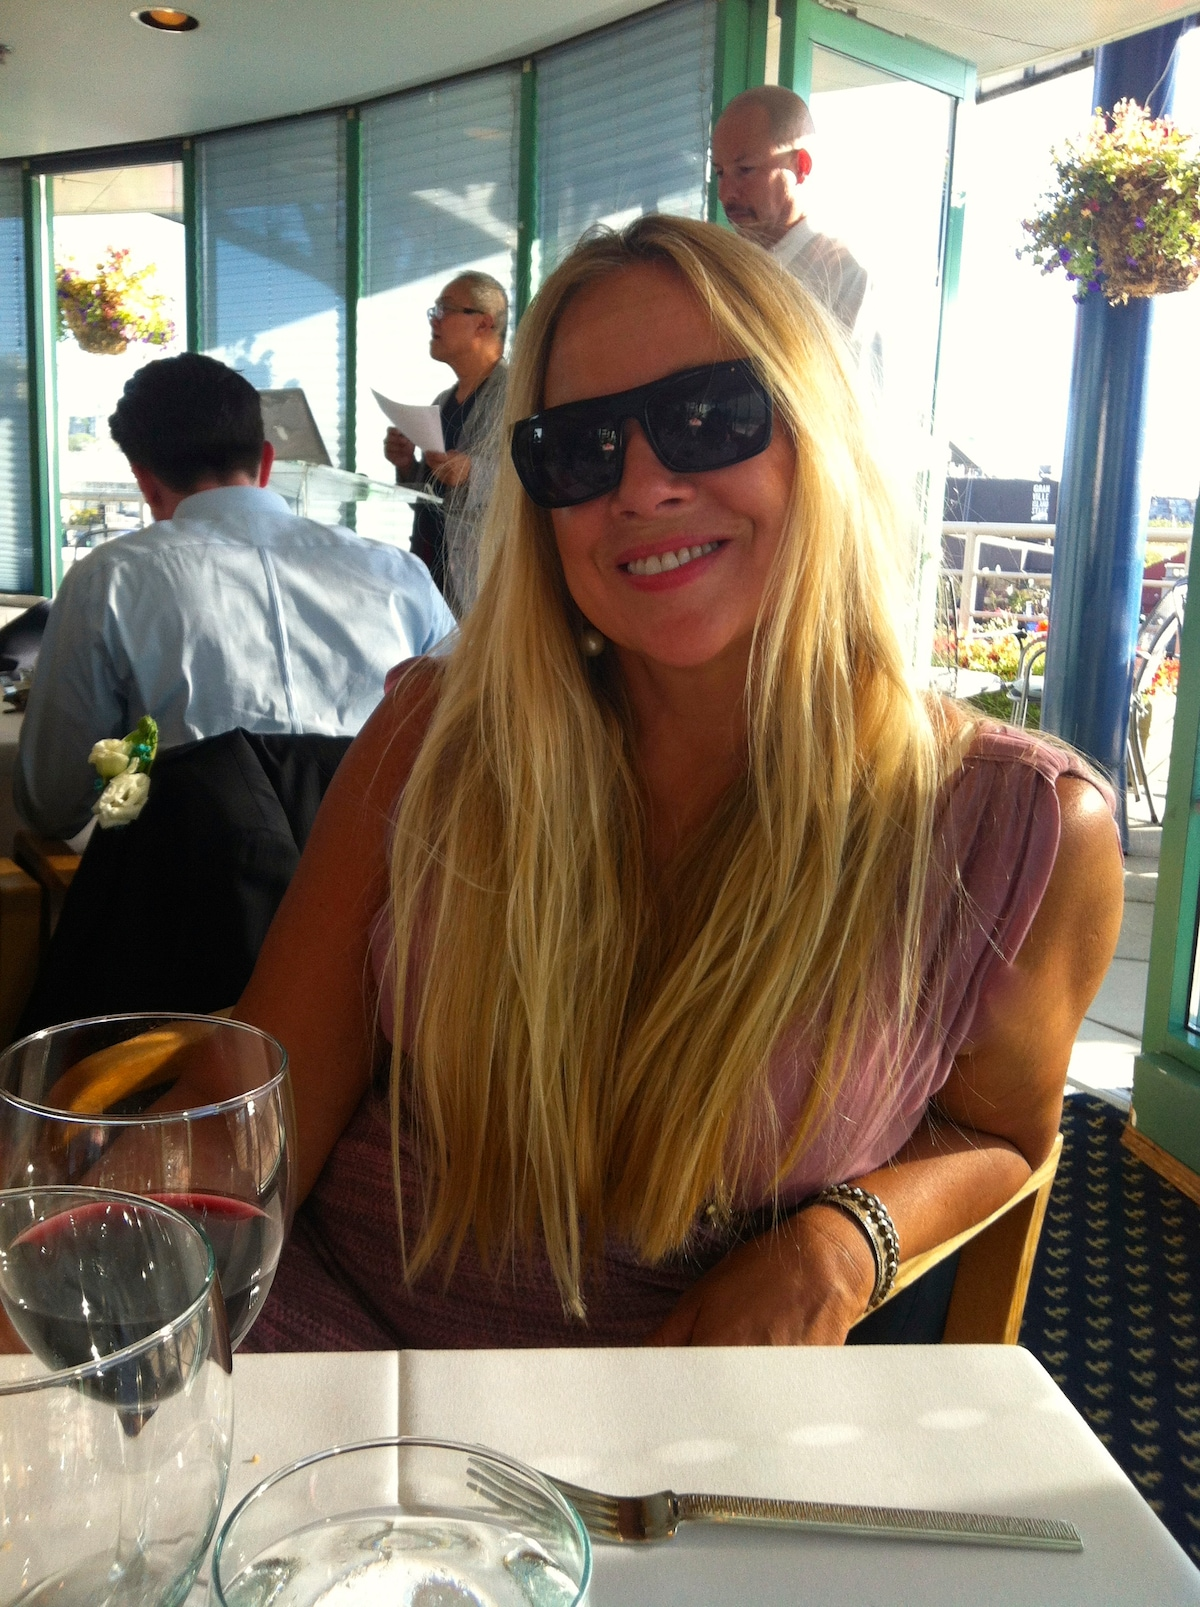 Alexandra from London